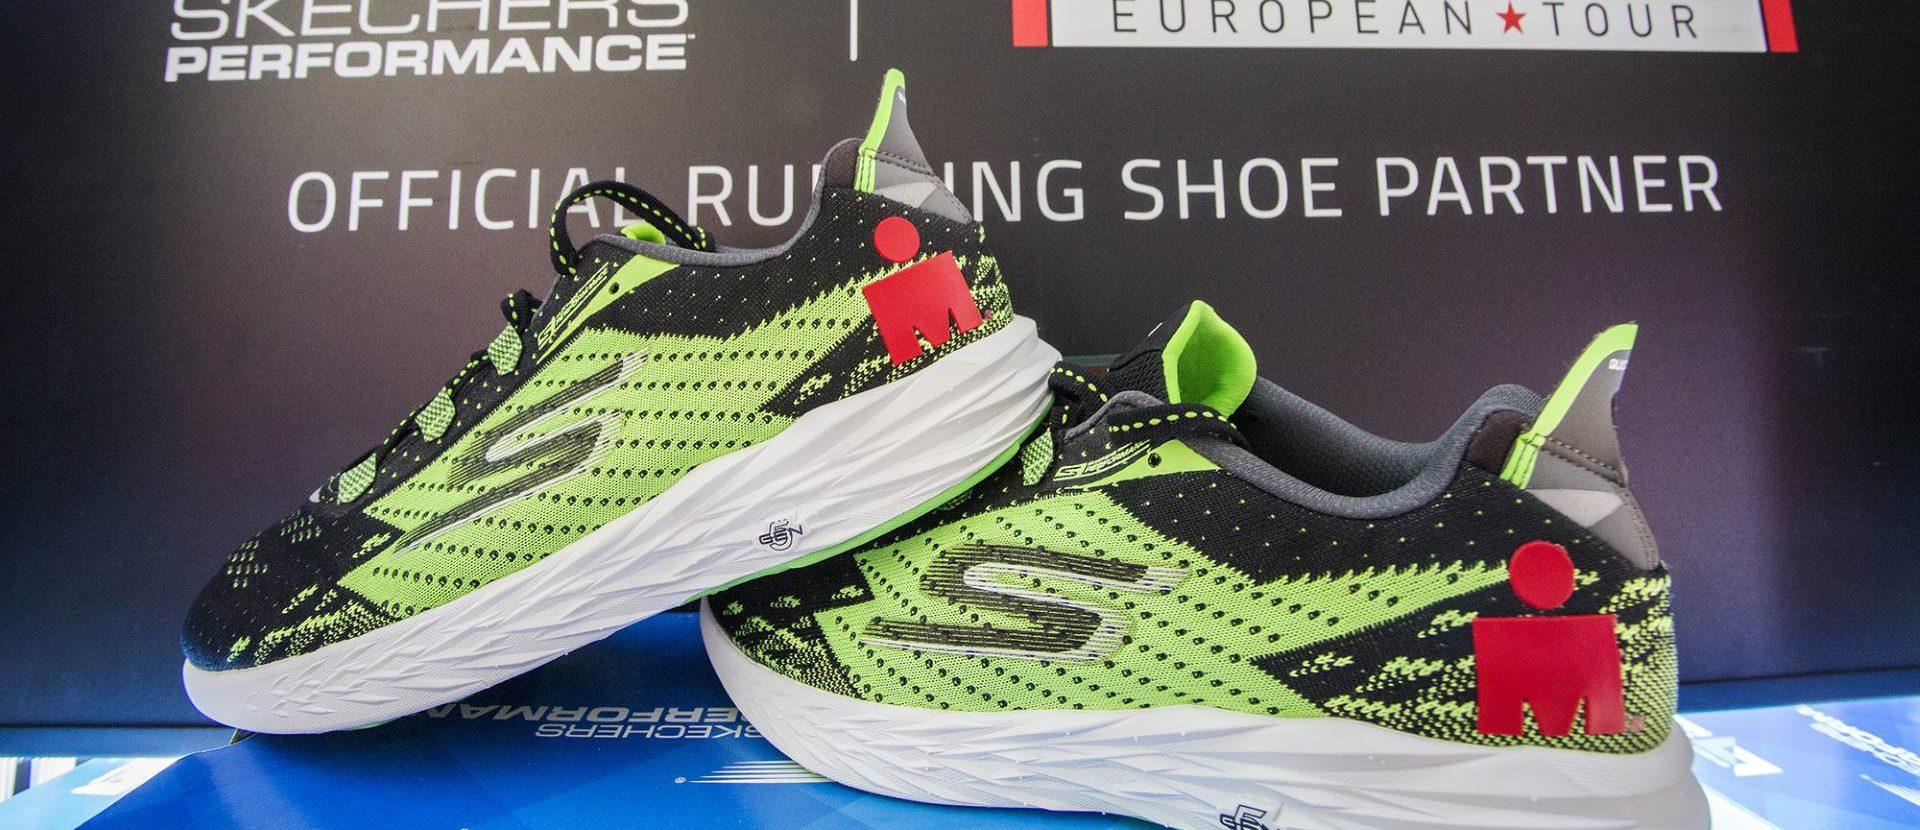 FOTO: Na pulskoj Ironman utrci predstavljene Skechers Performance Gorun 5 style tenisice